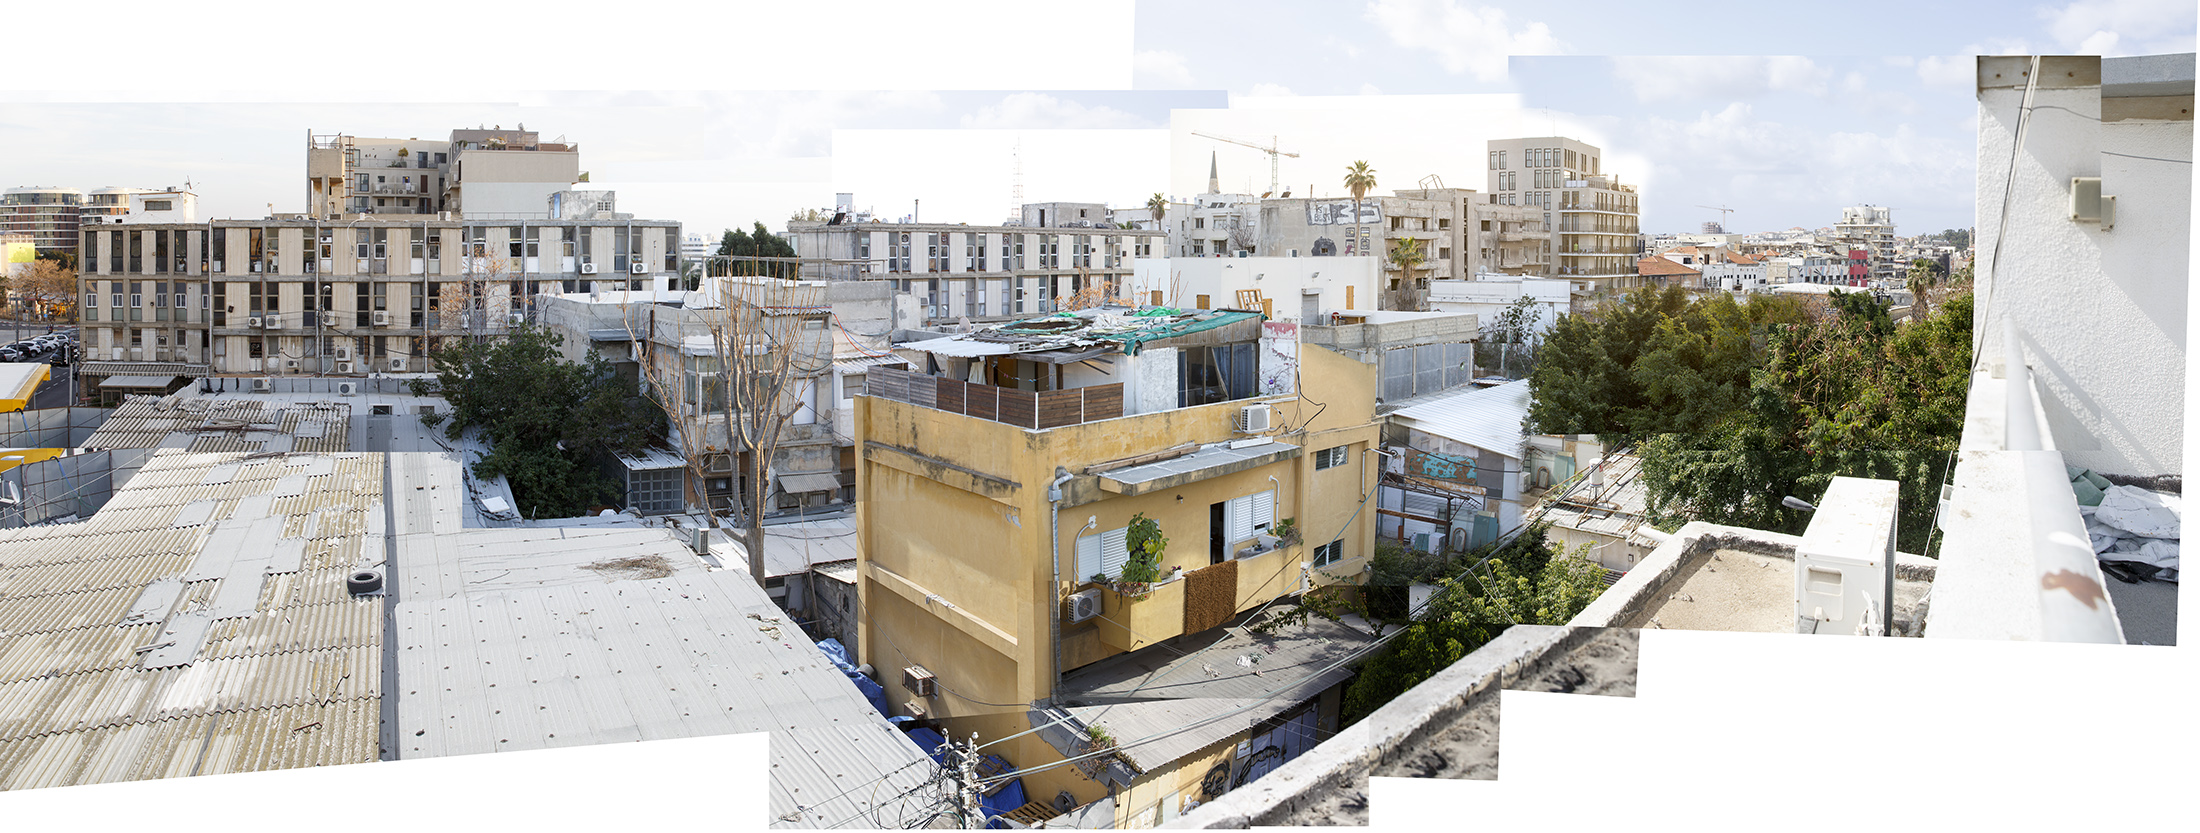 Eilat st., 2017, photo-collage, inkjet print, 95x250 cm